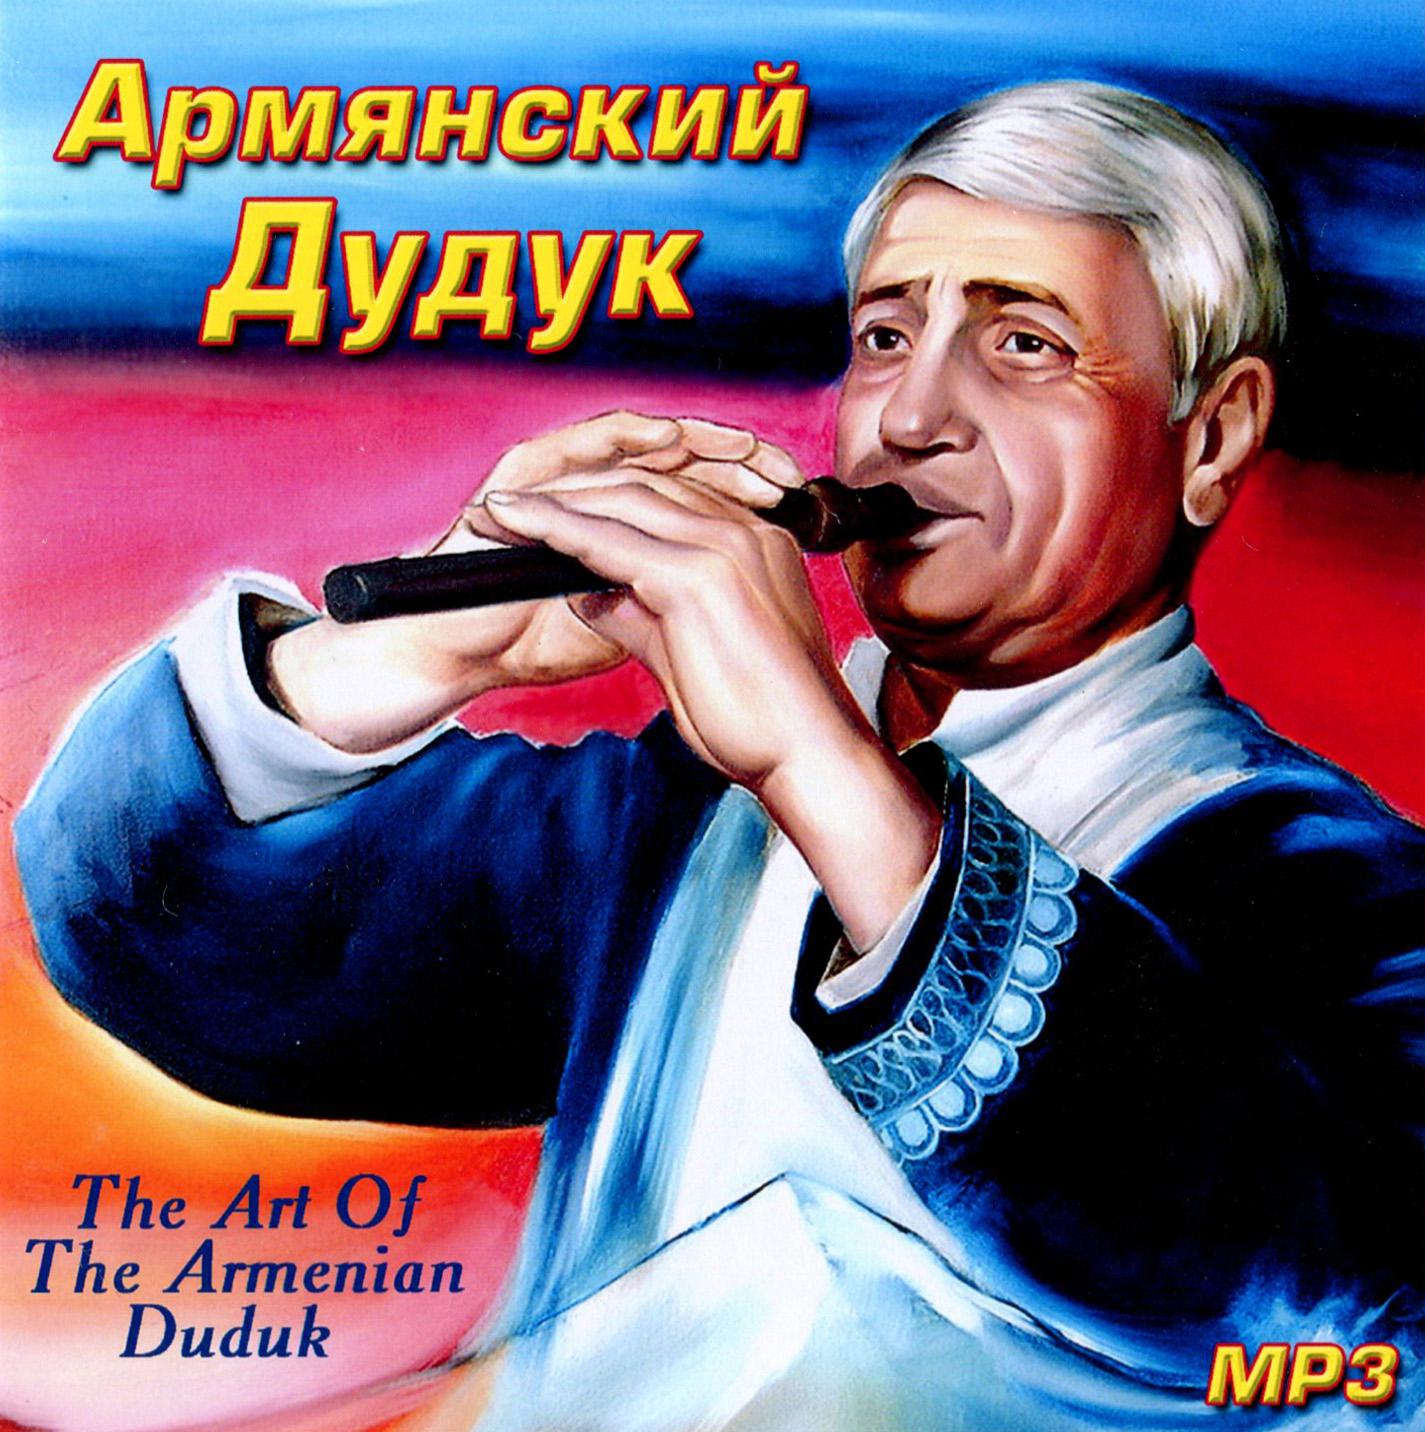 Армянский Дудук [mp3]